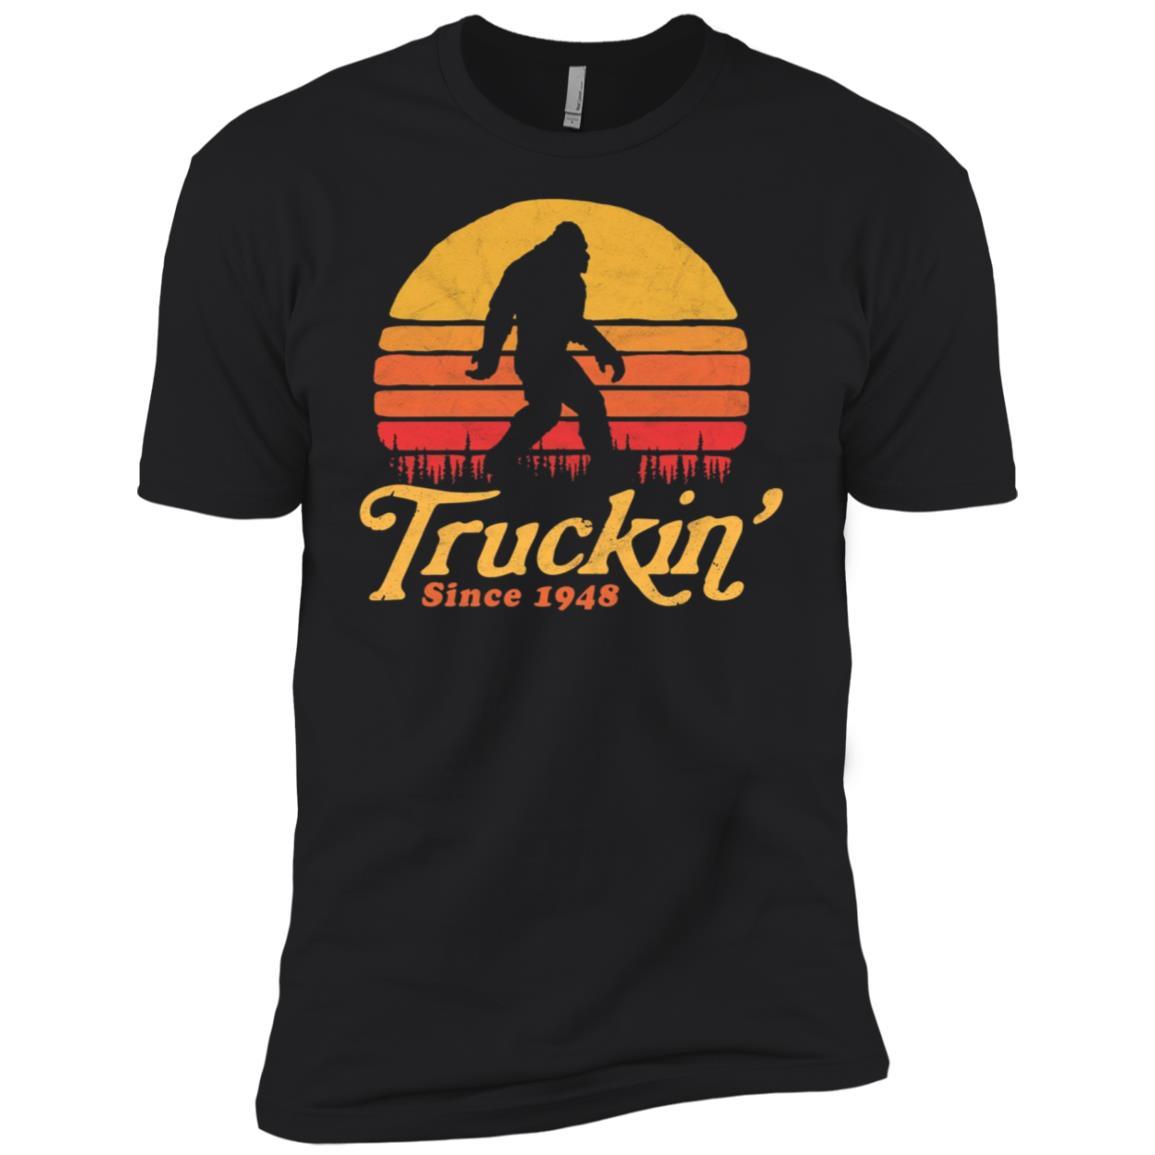 Truckin' Since 1948 Bigfoot 70th Birthday Men Short Sleeve T-Shirt